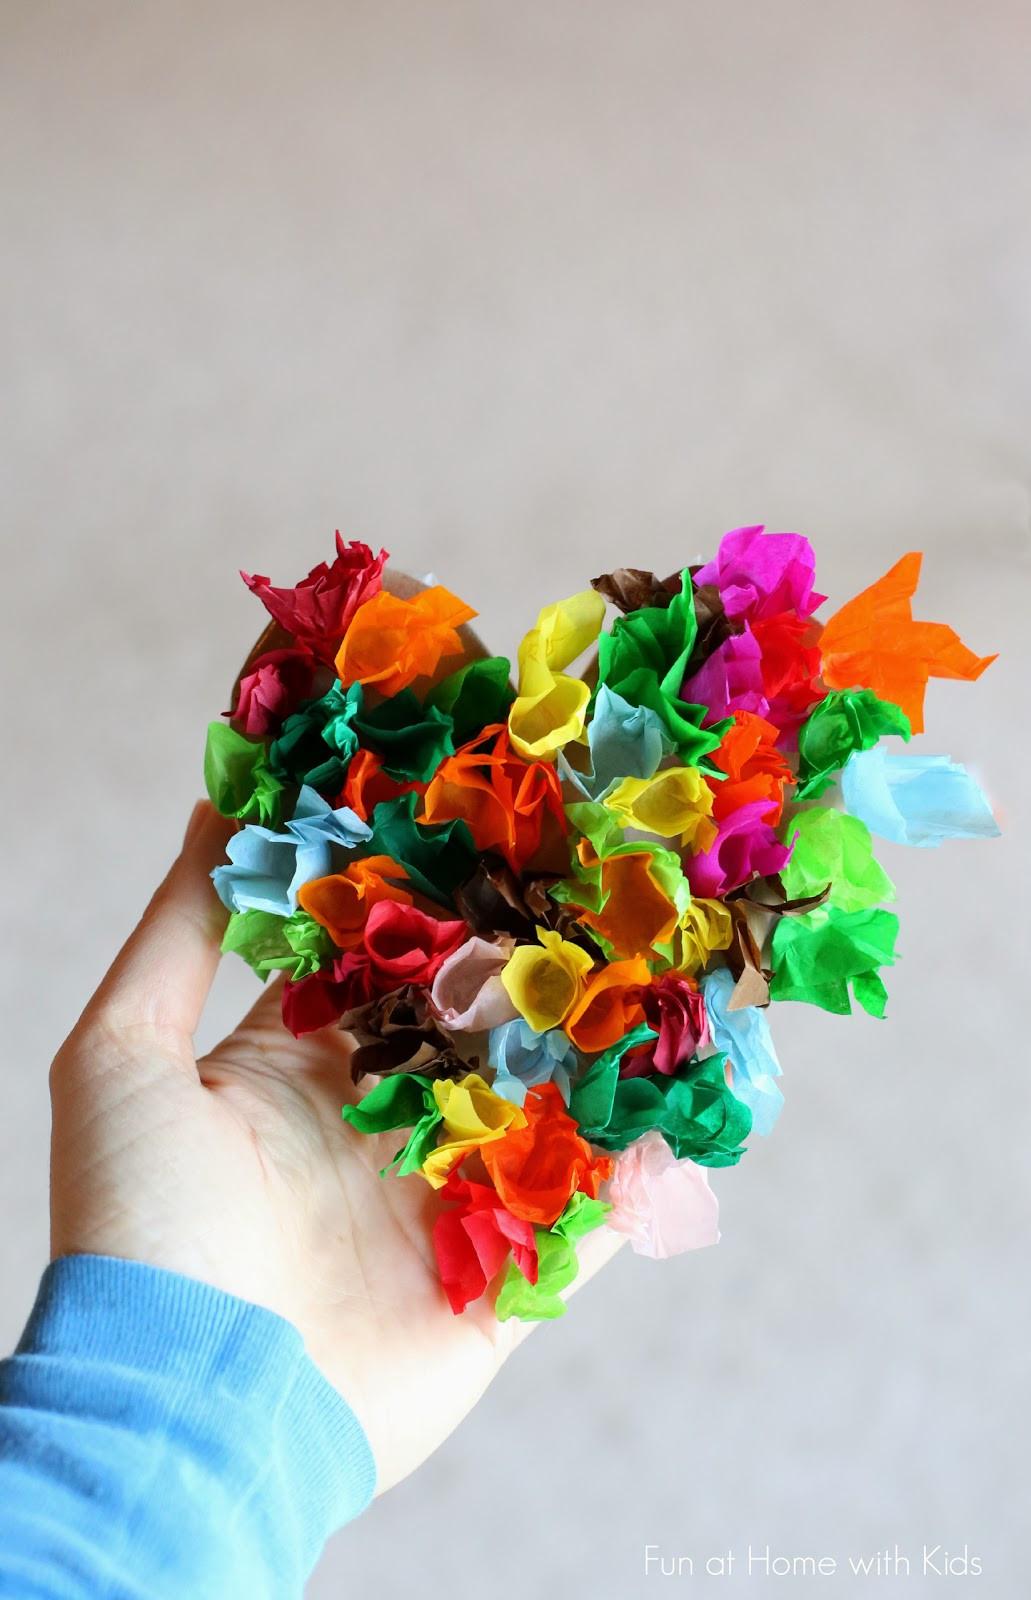 Fun Craft For Preschoolers  14 Valentine s Day Activities for Toddlers and Preschoolers